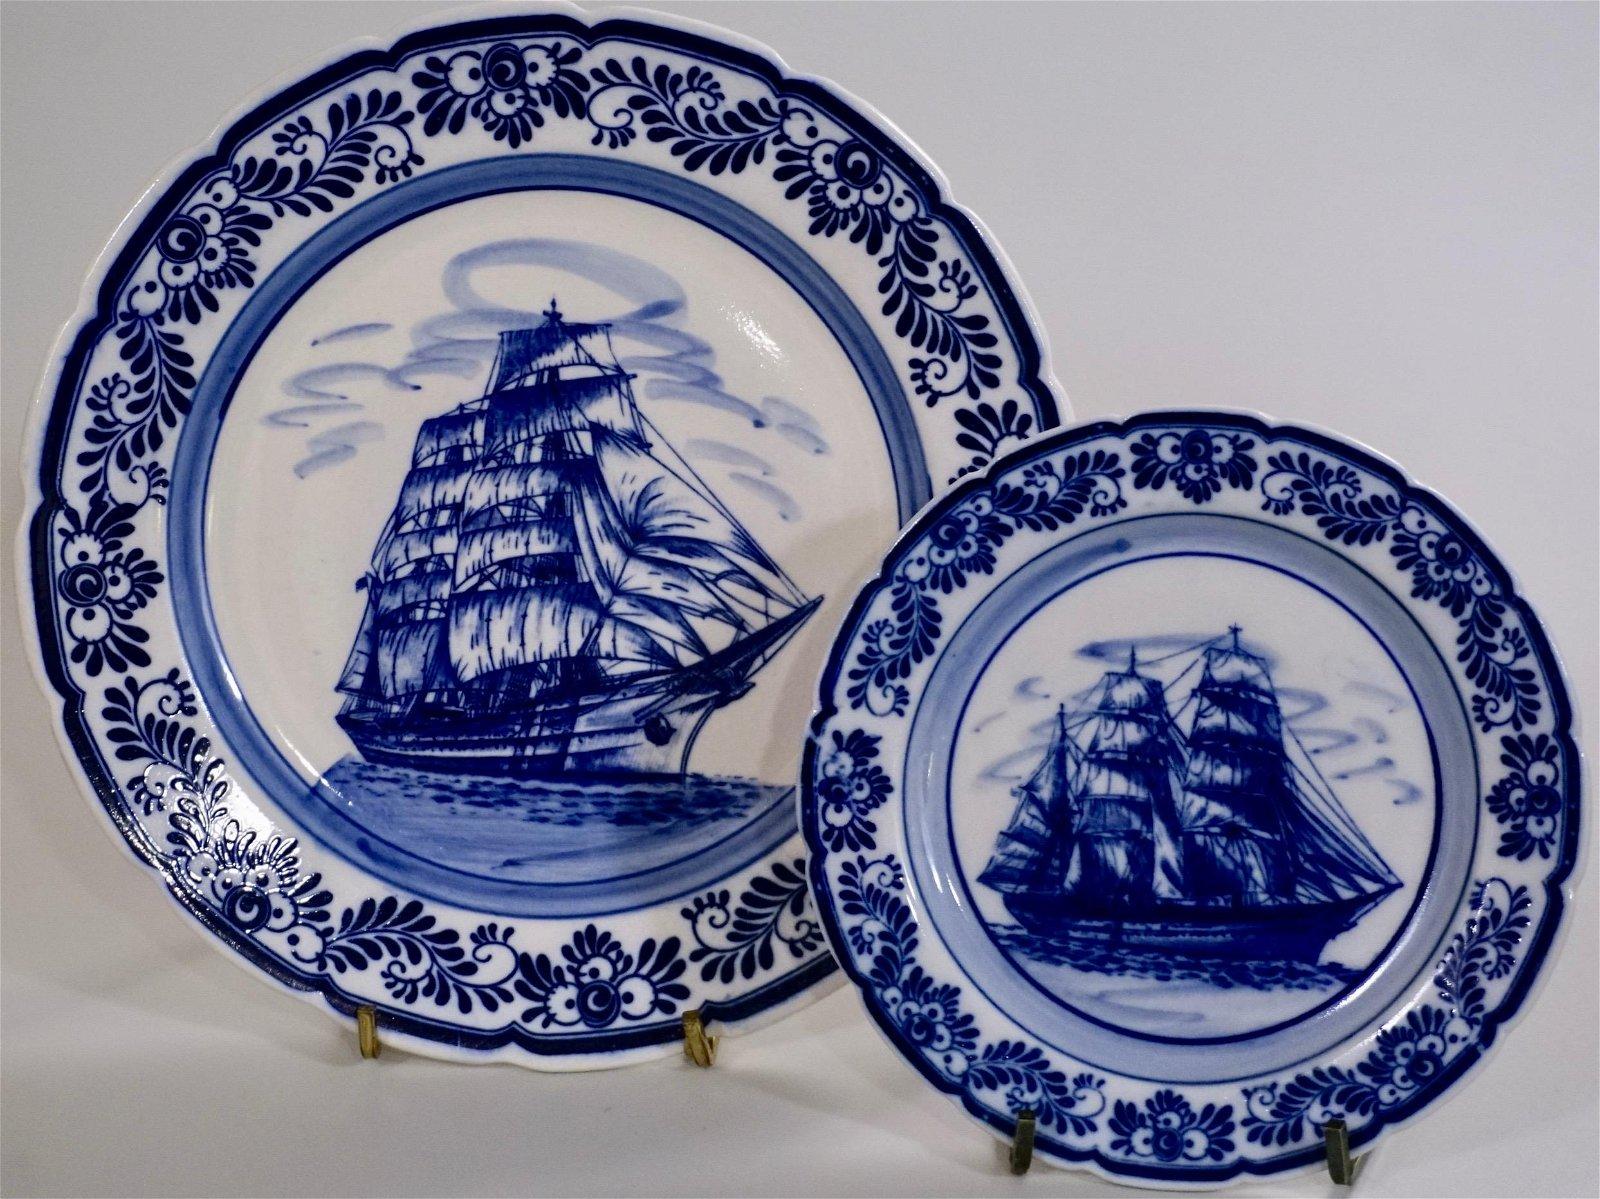 Nautical Flow Blue Sailing Ship Royal Delft Plate Wall